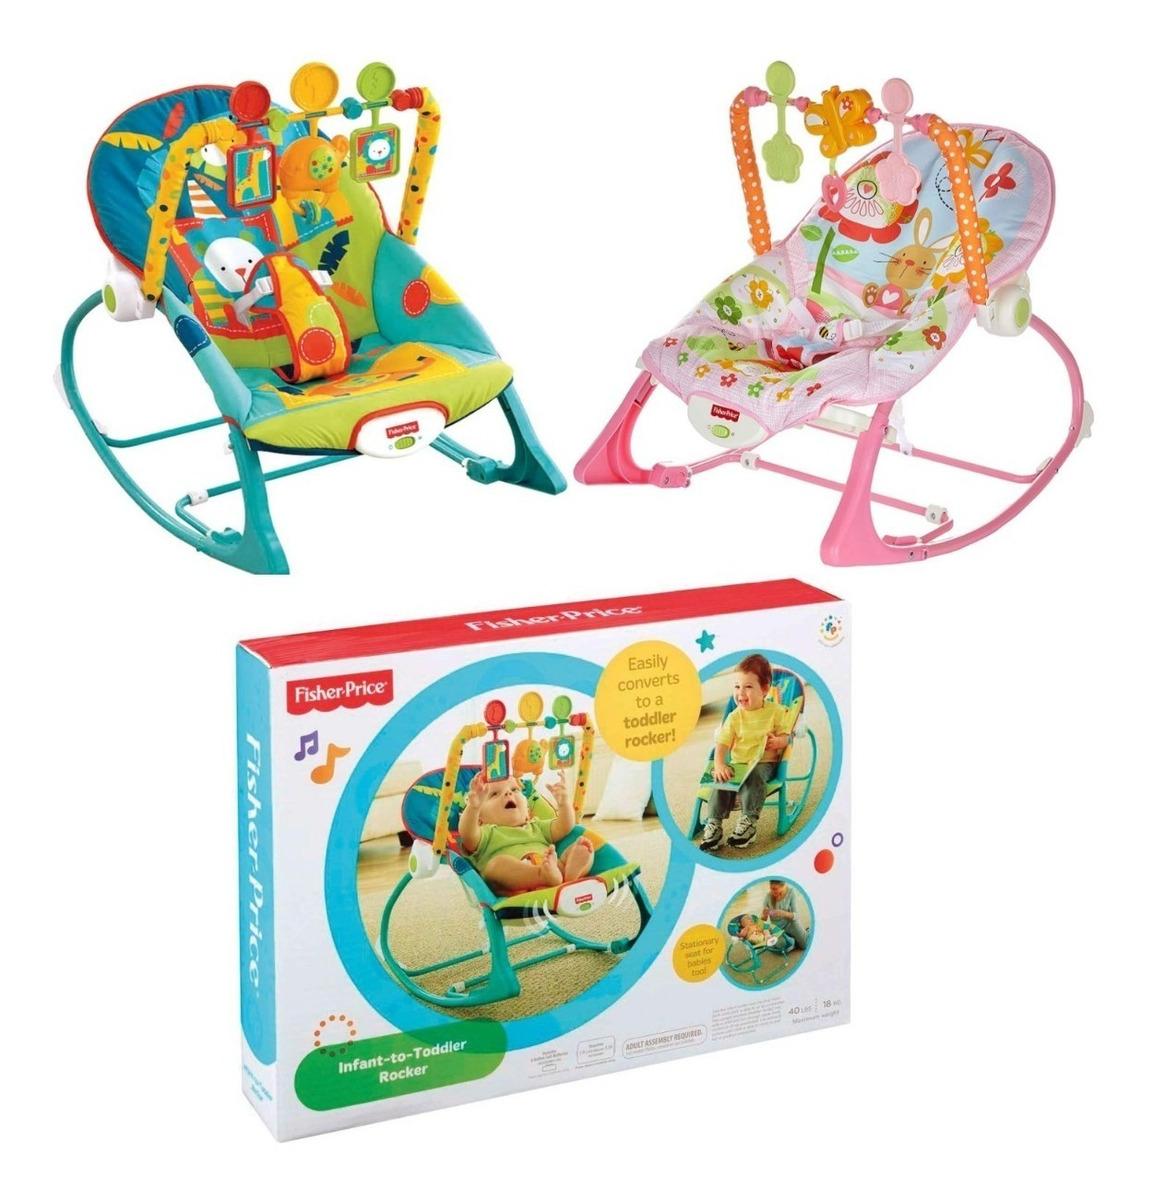 882976503283 silla mecedora crece conmigo bebe fisher price elige color. Cargando zoom.